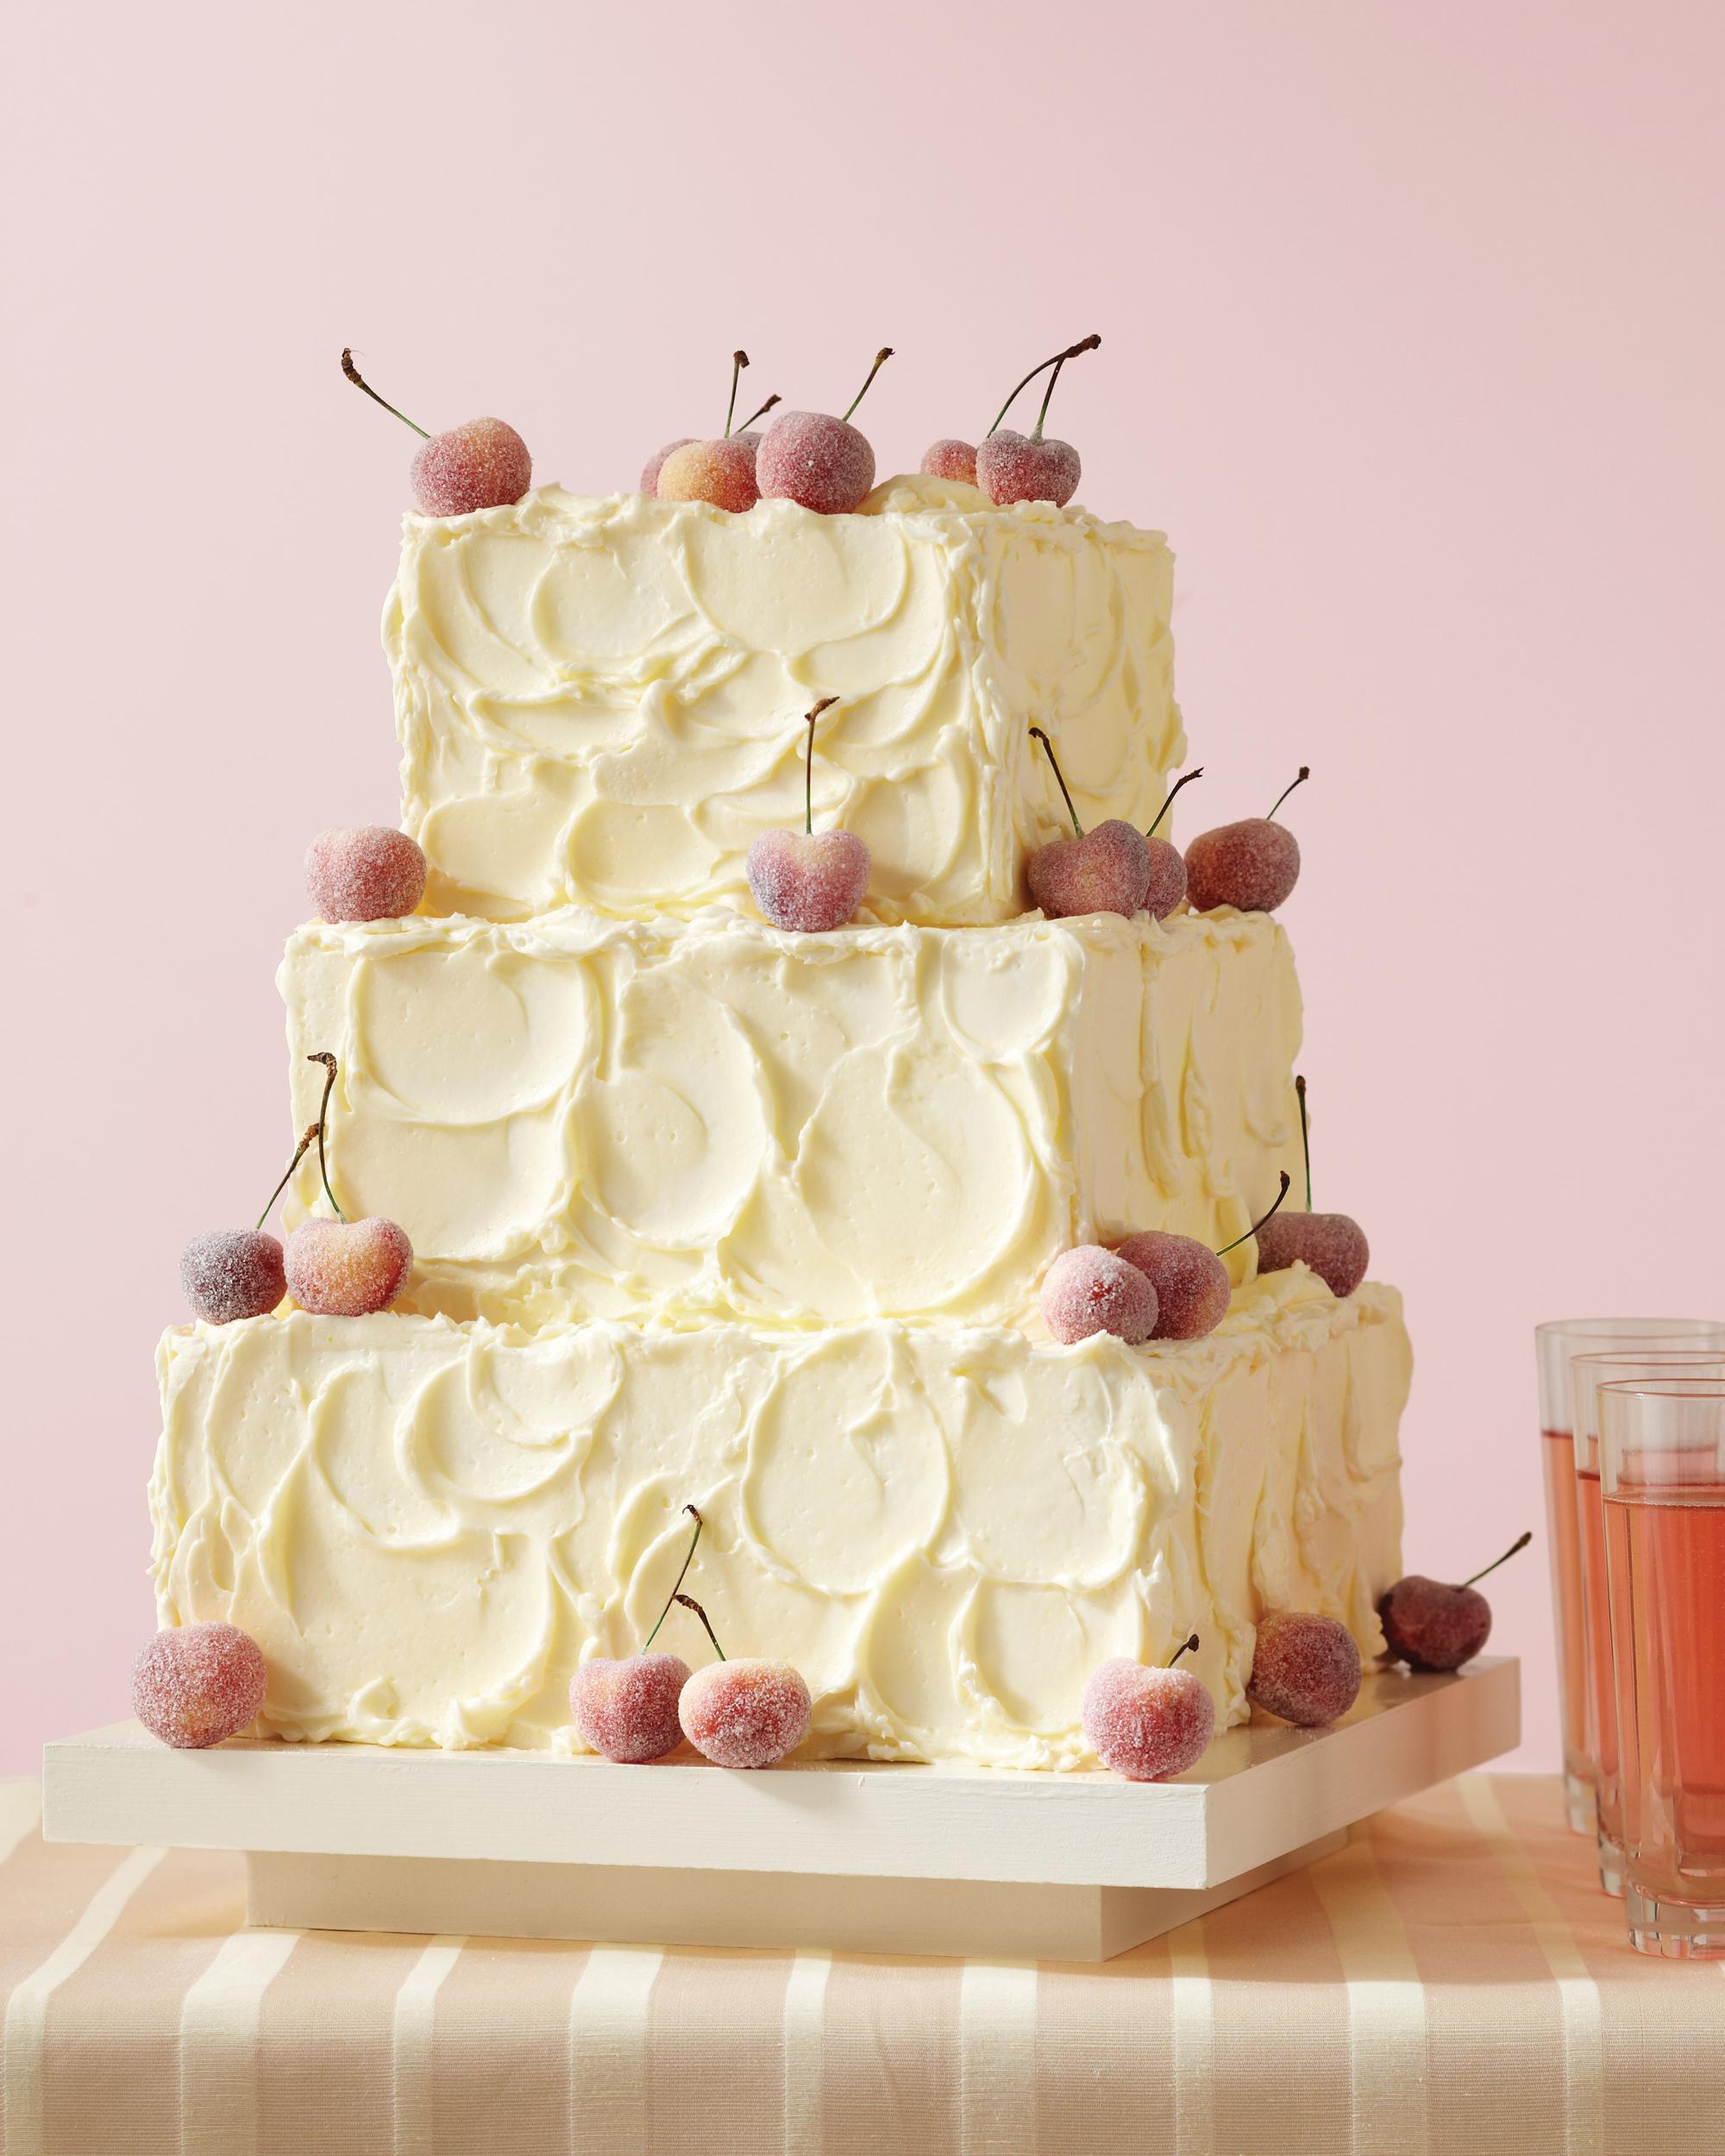 cakes05h-sum11mwd107083.jpg